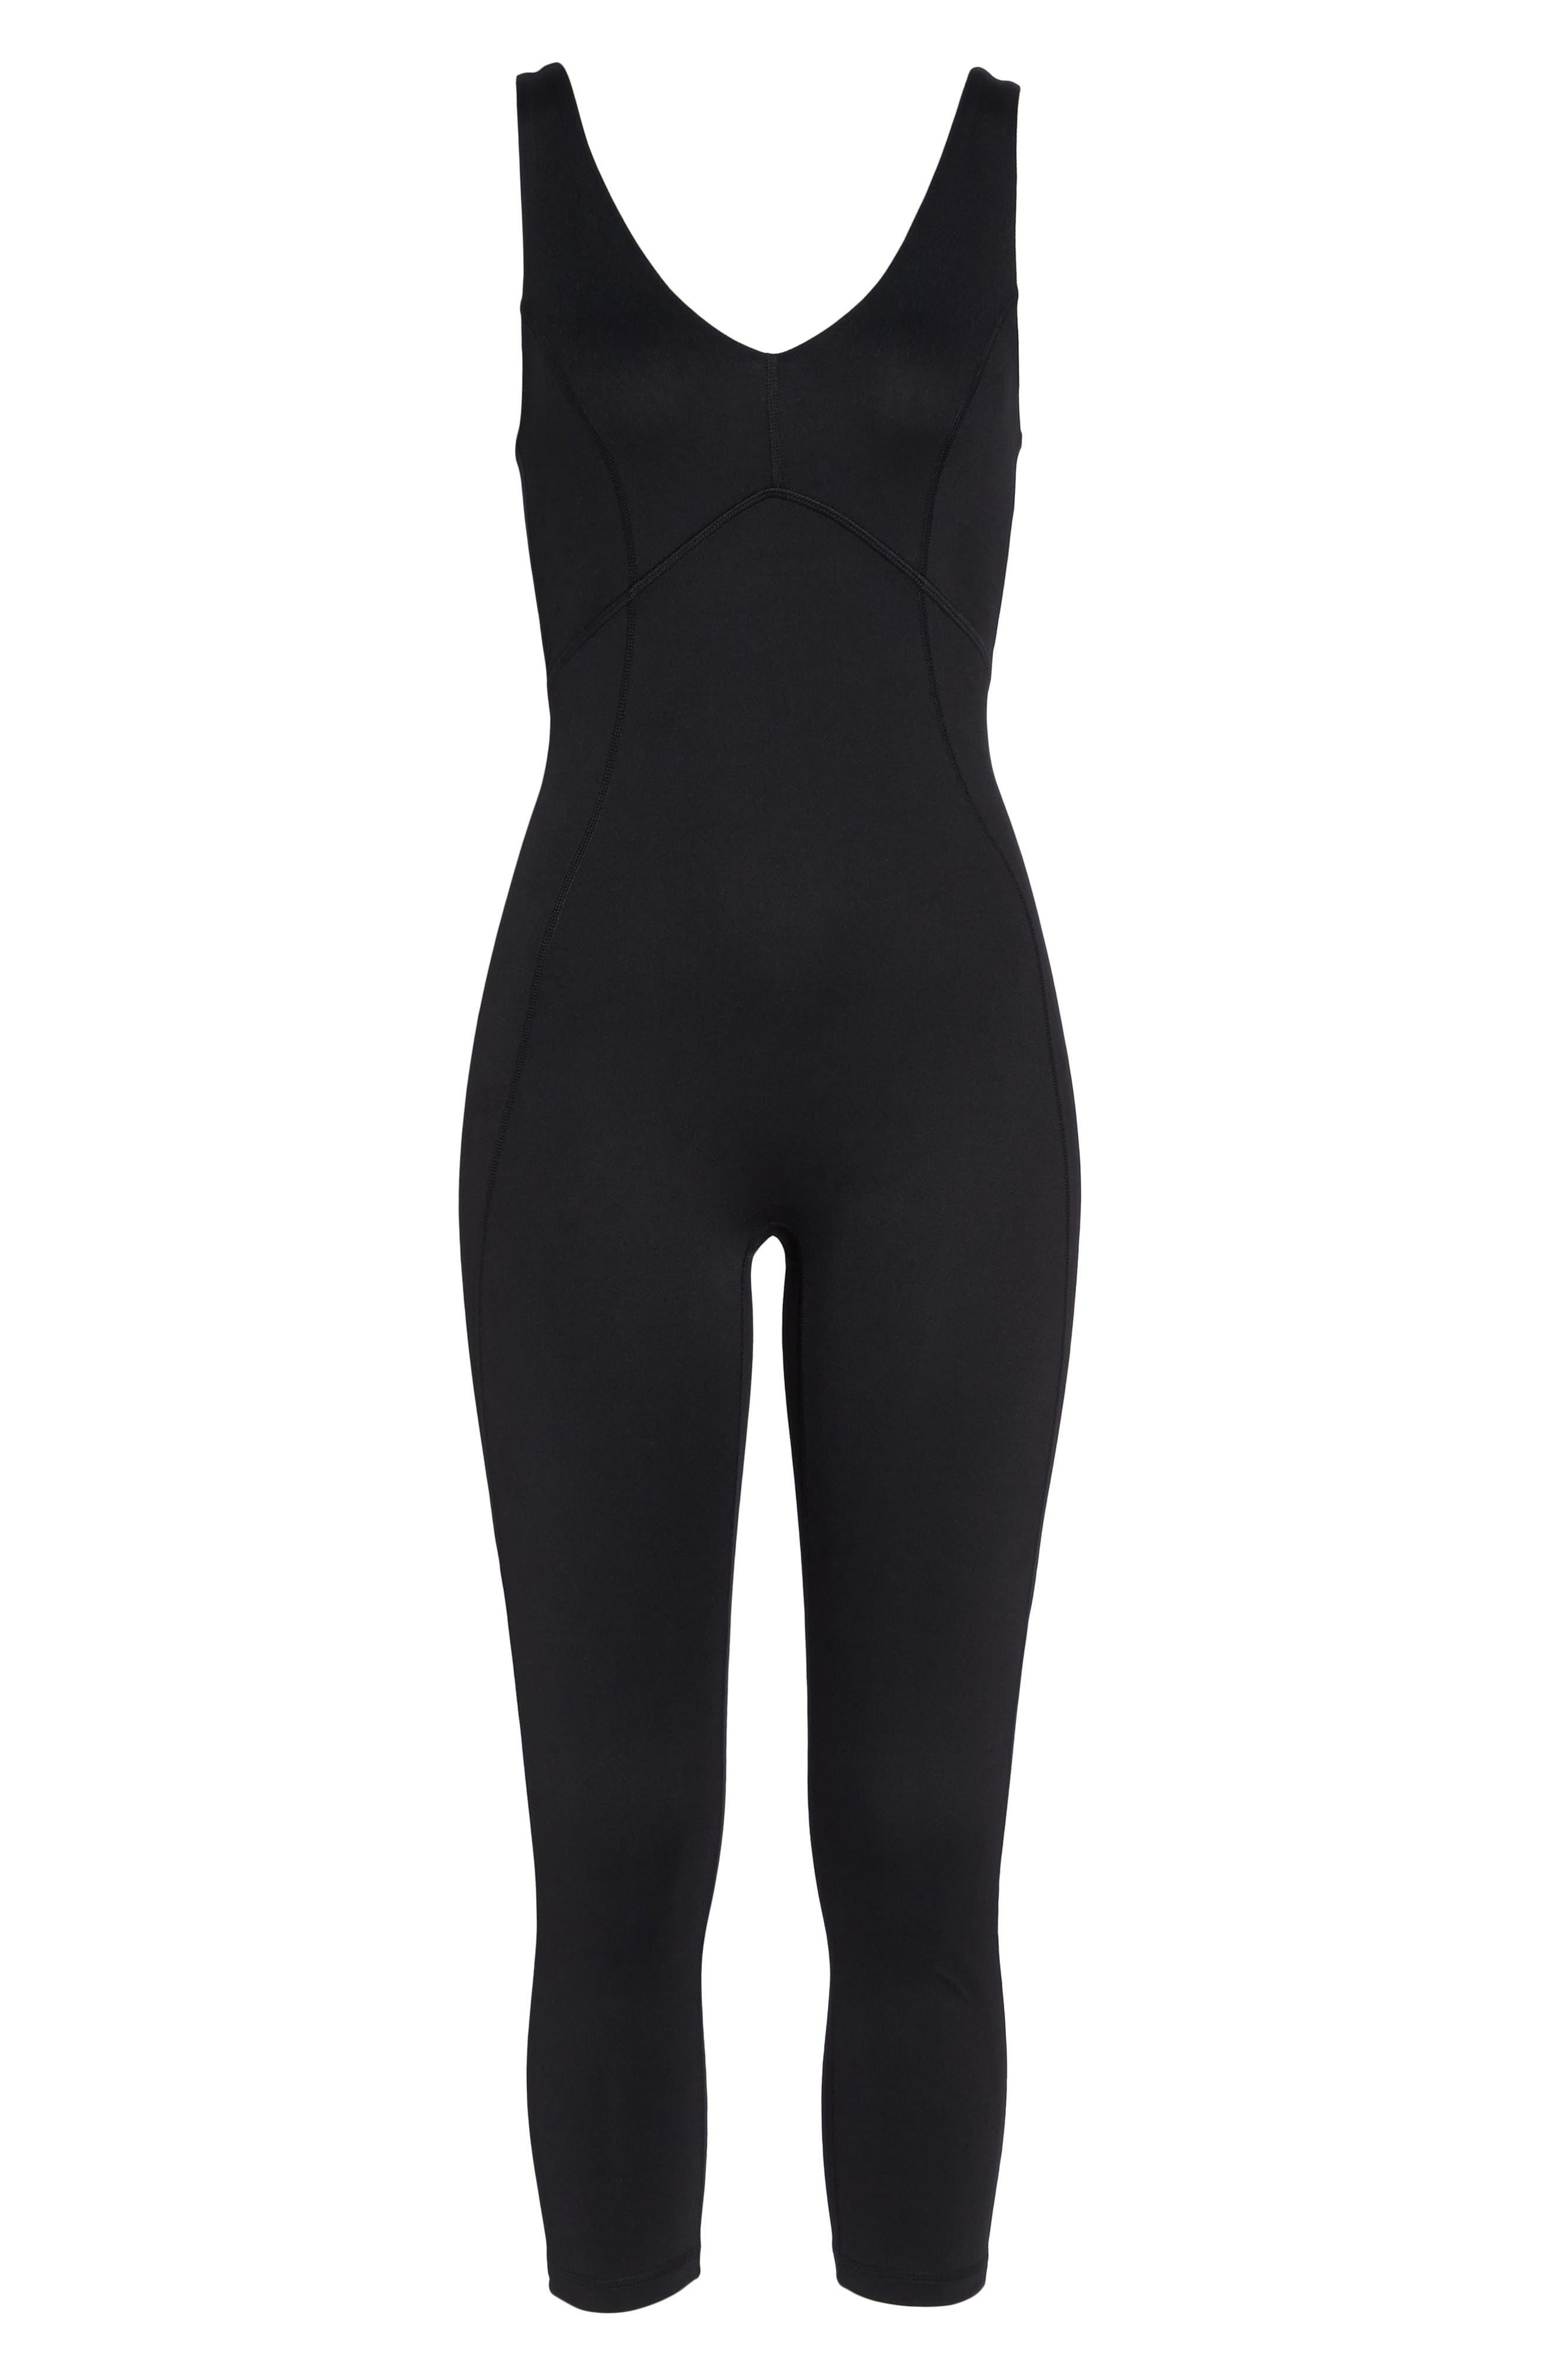 Lighten Up Crop Bodysuit,                             Alternate thumbnail 7, color,                             Black